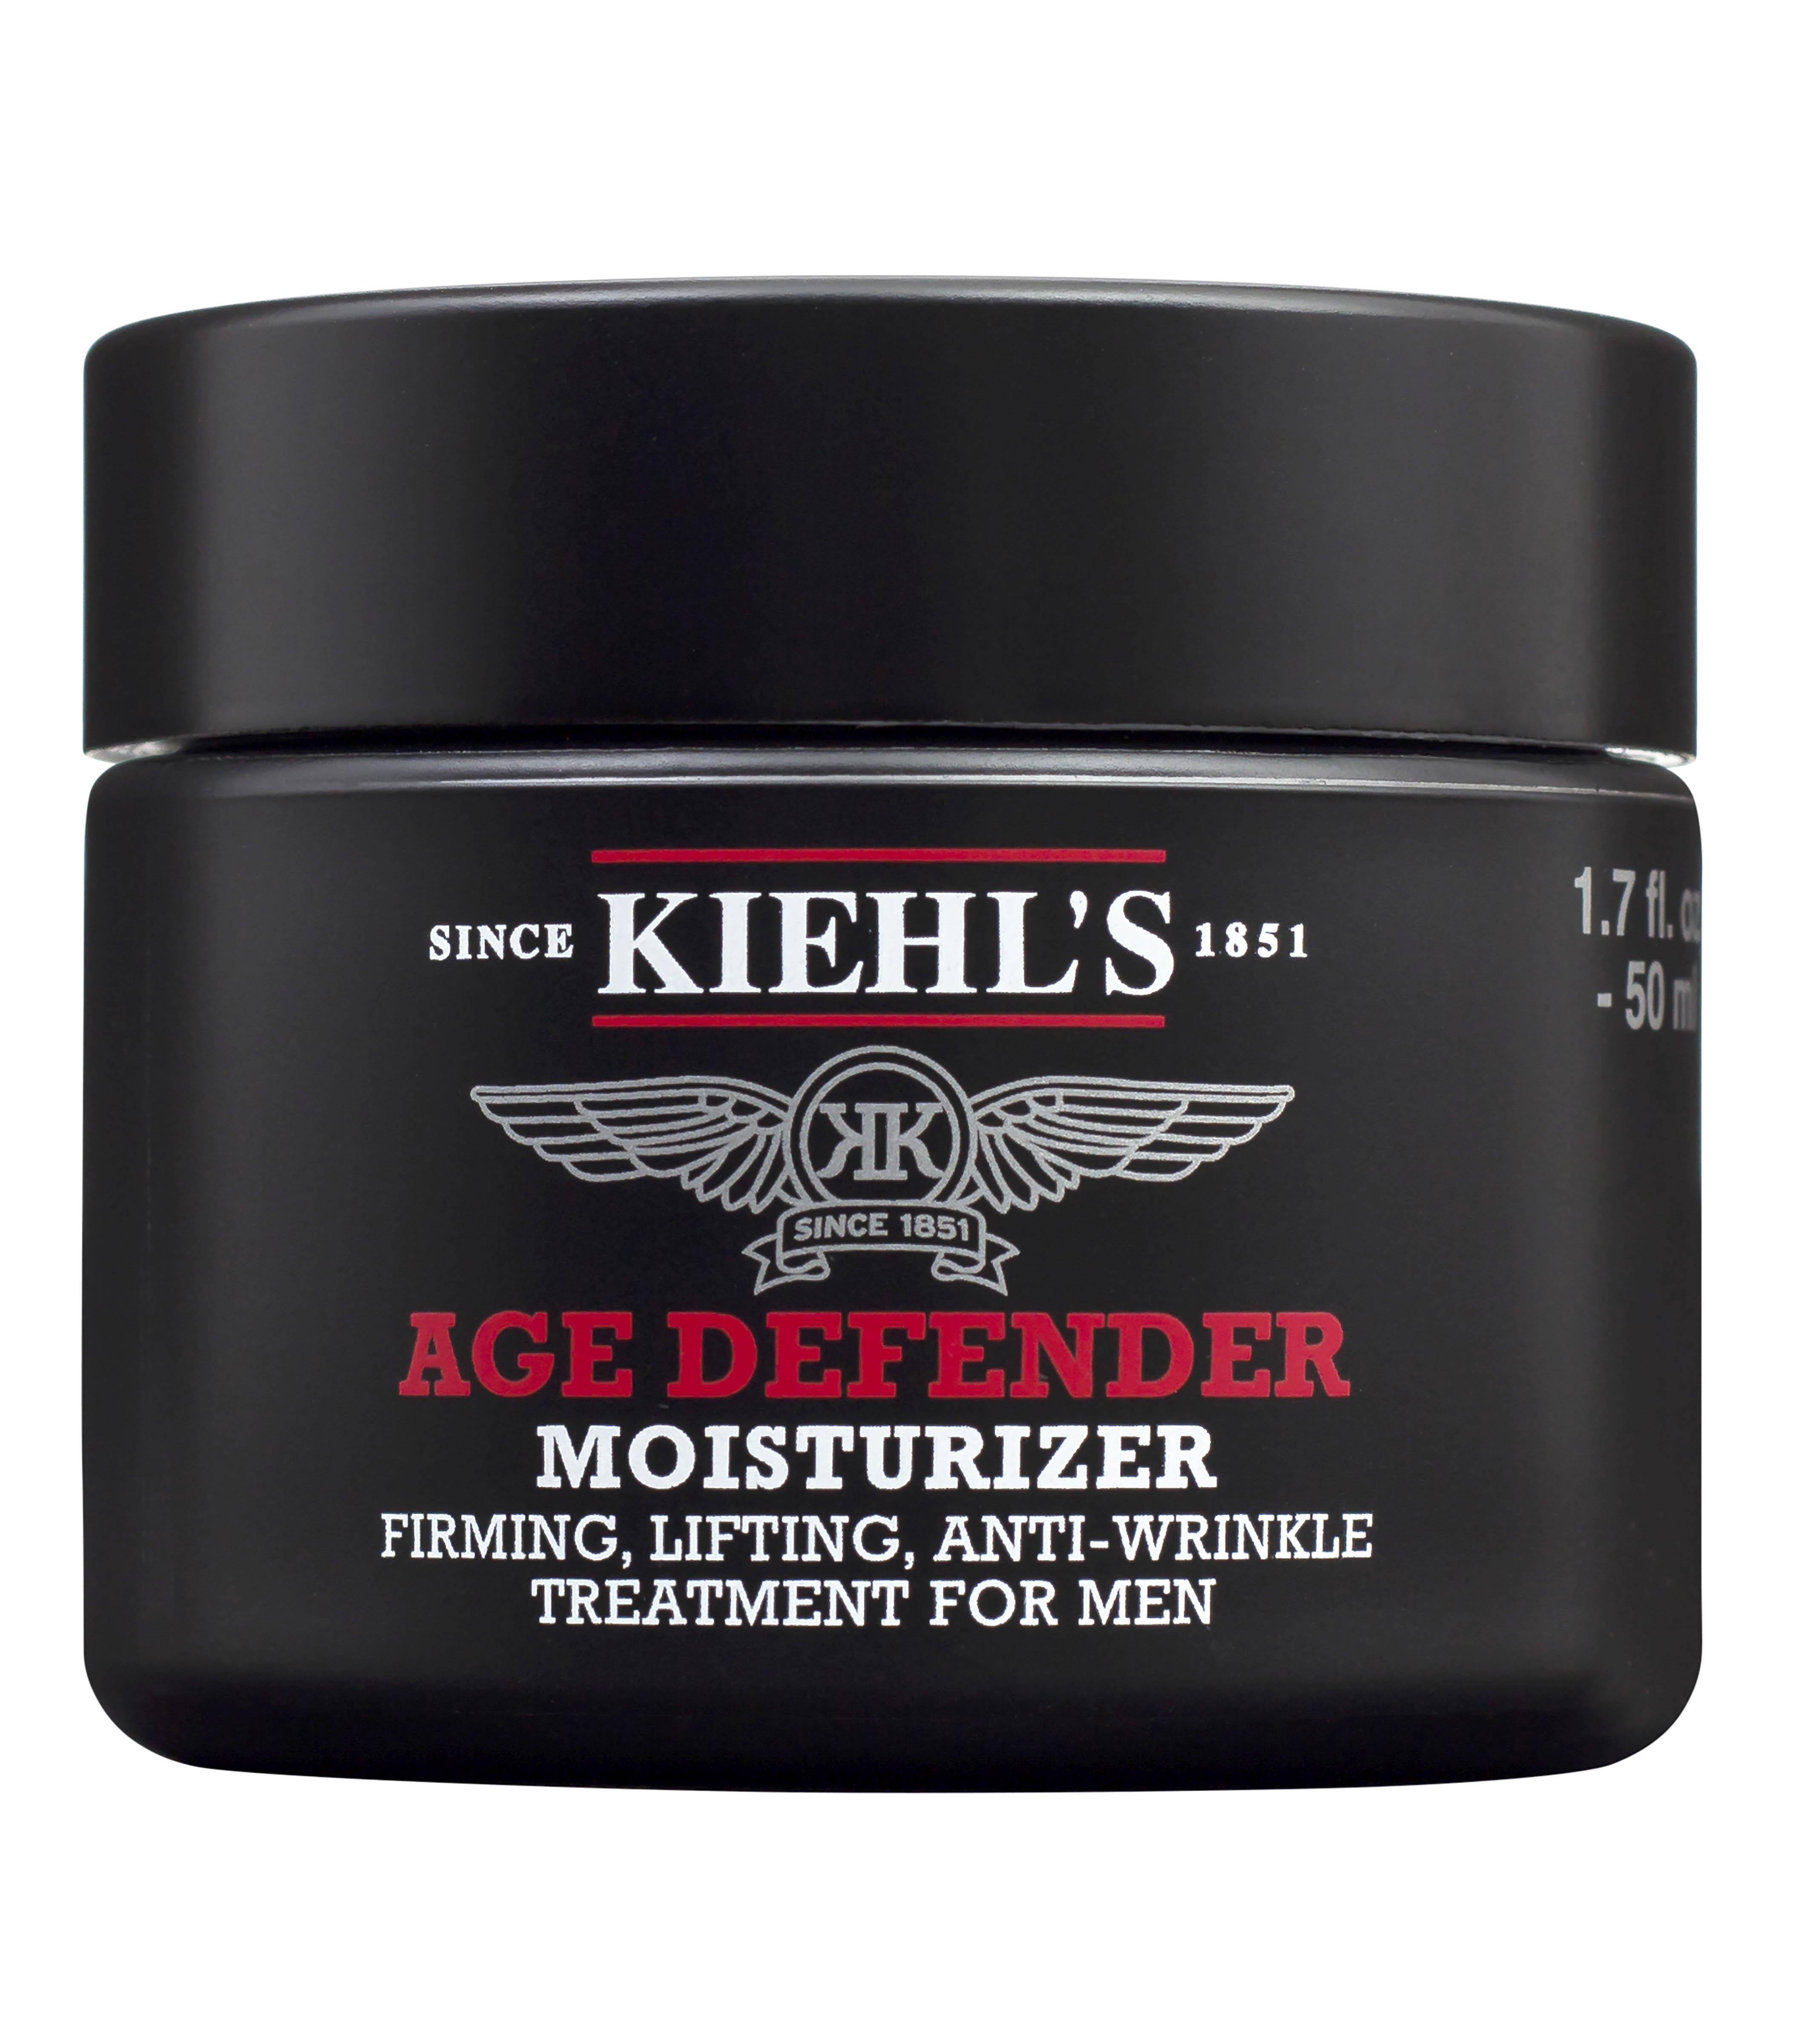 age_defender_moisturizer_50ml